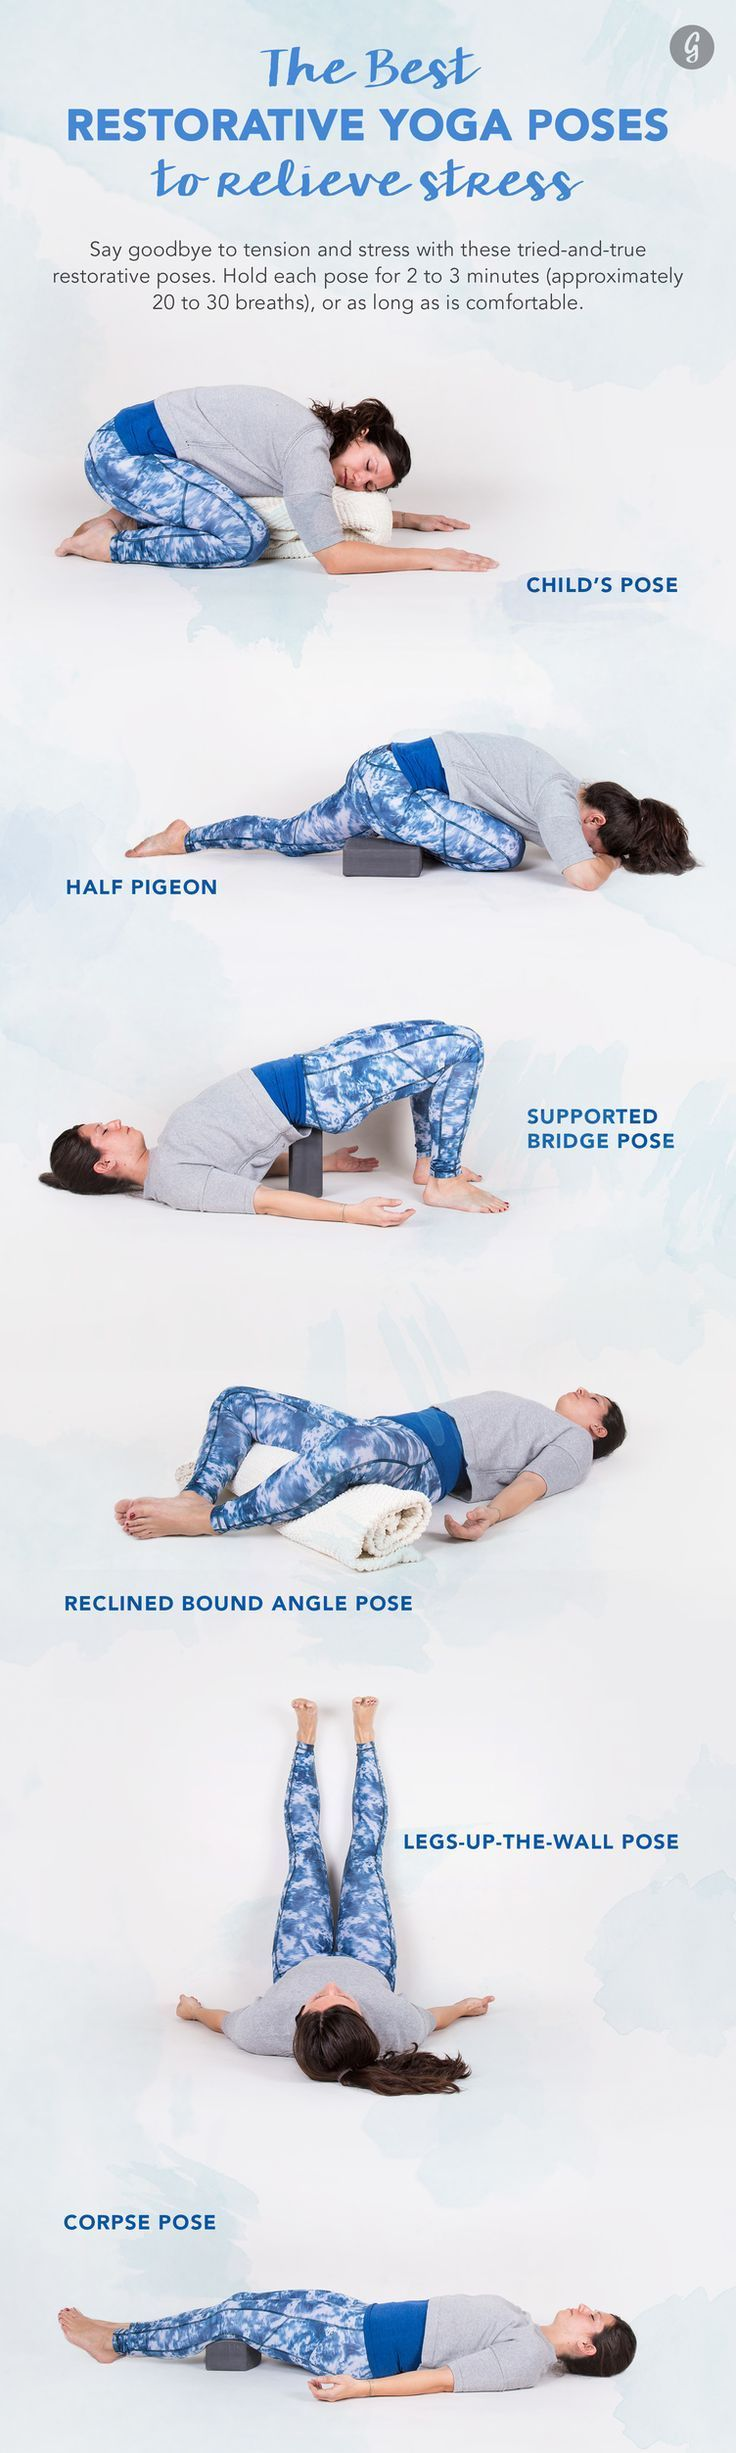 The Best Restorative Yoga Poses #restorative #yoga #greatist...